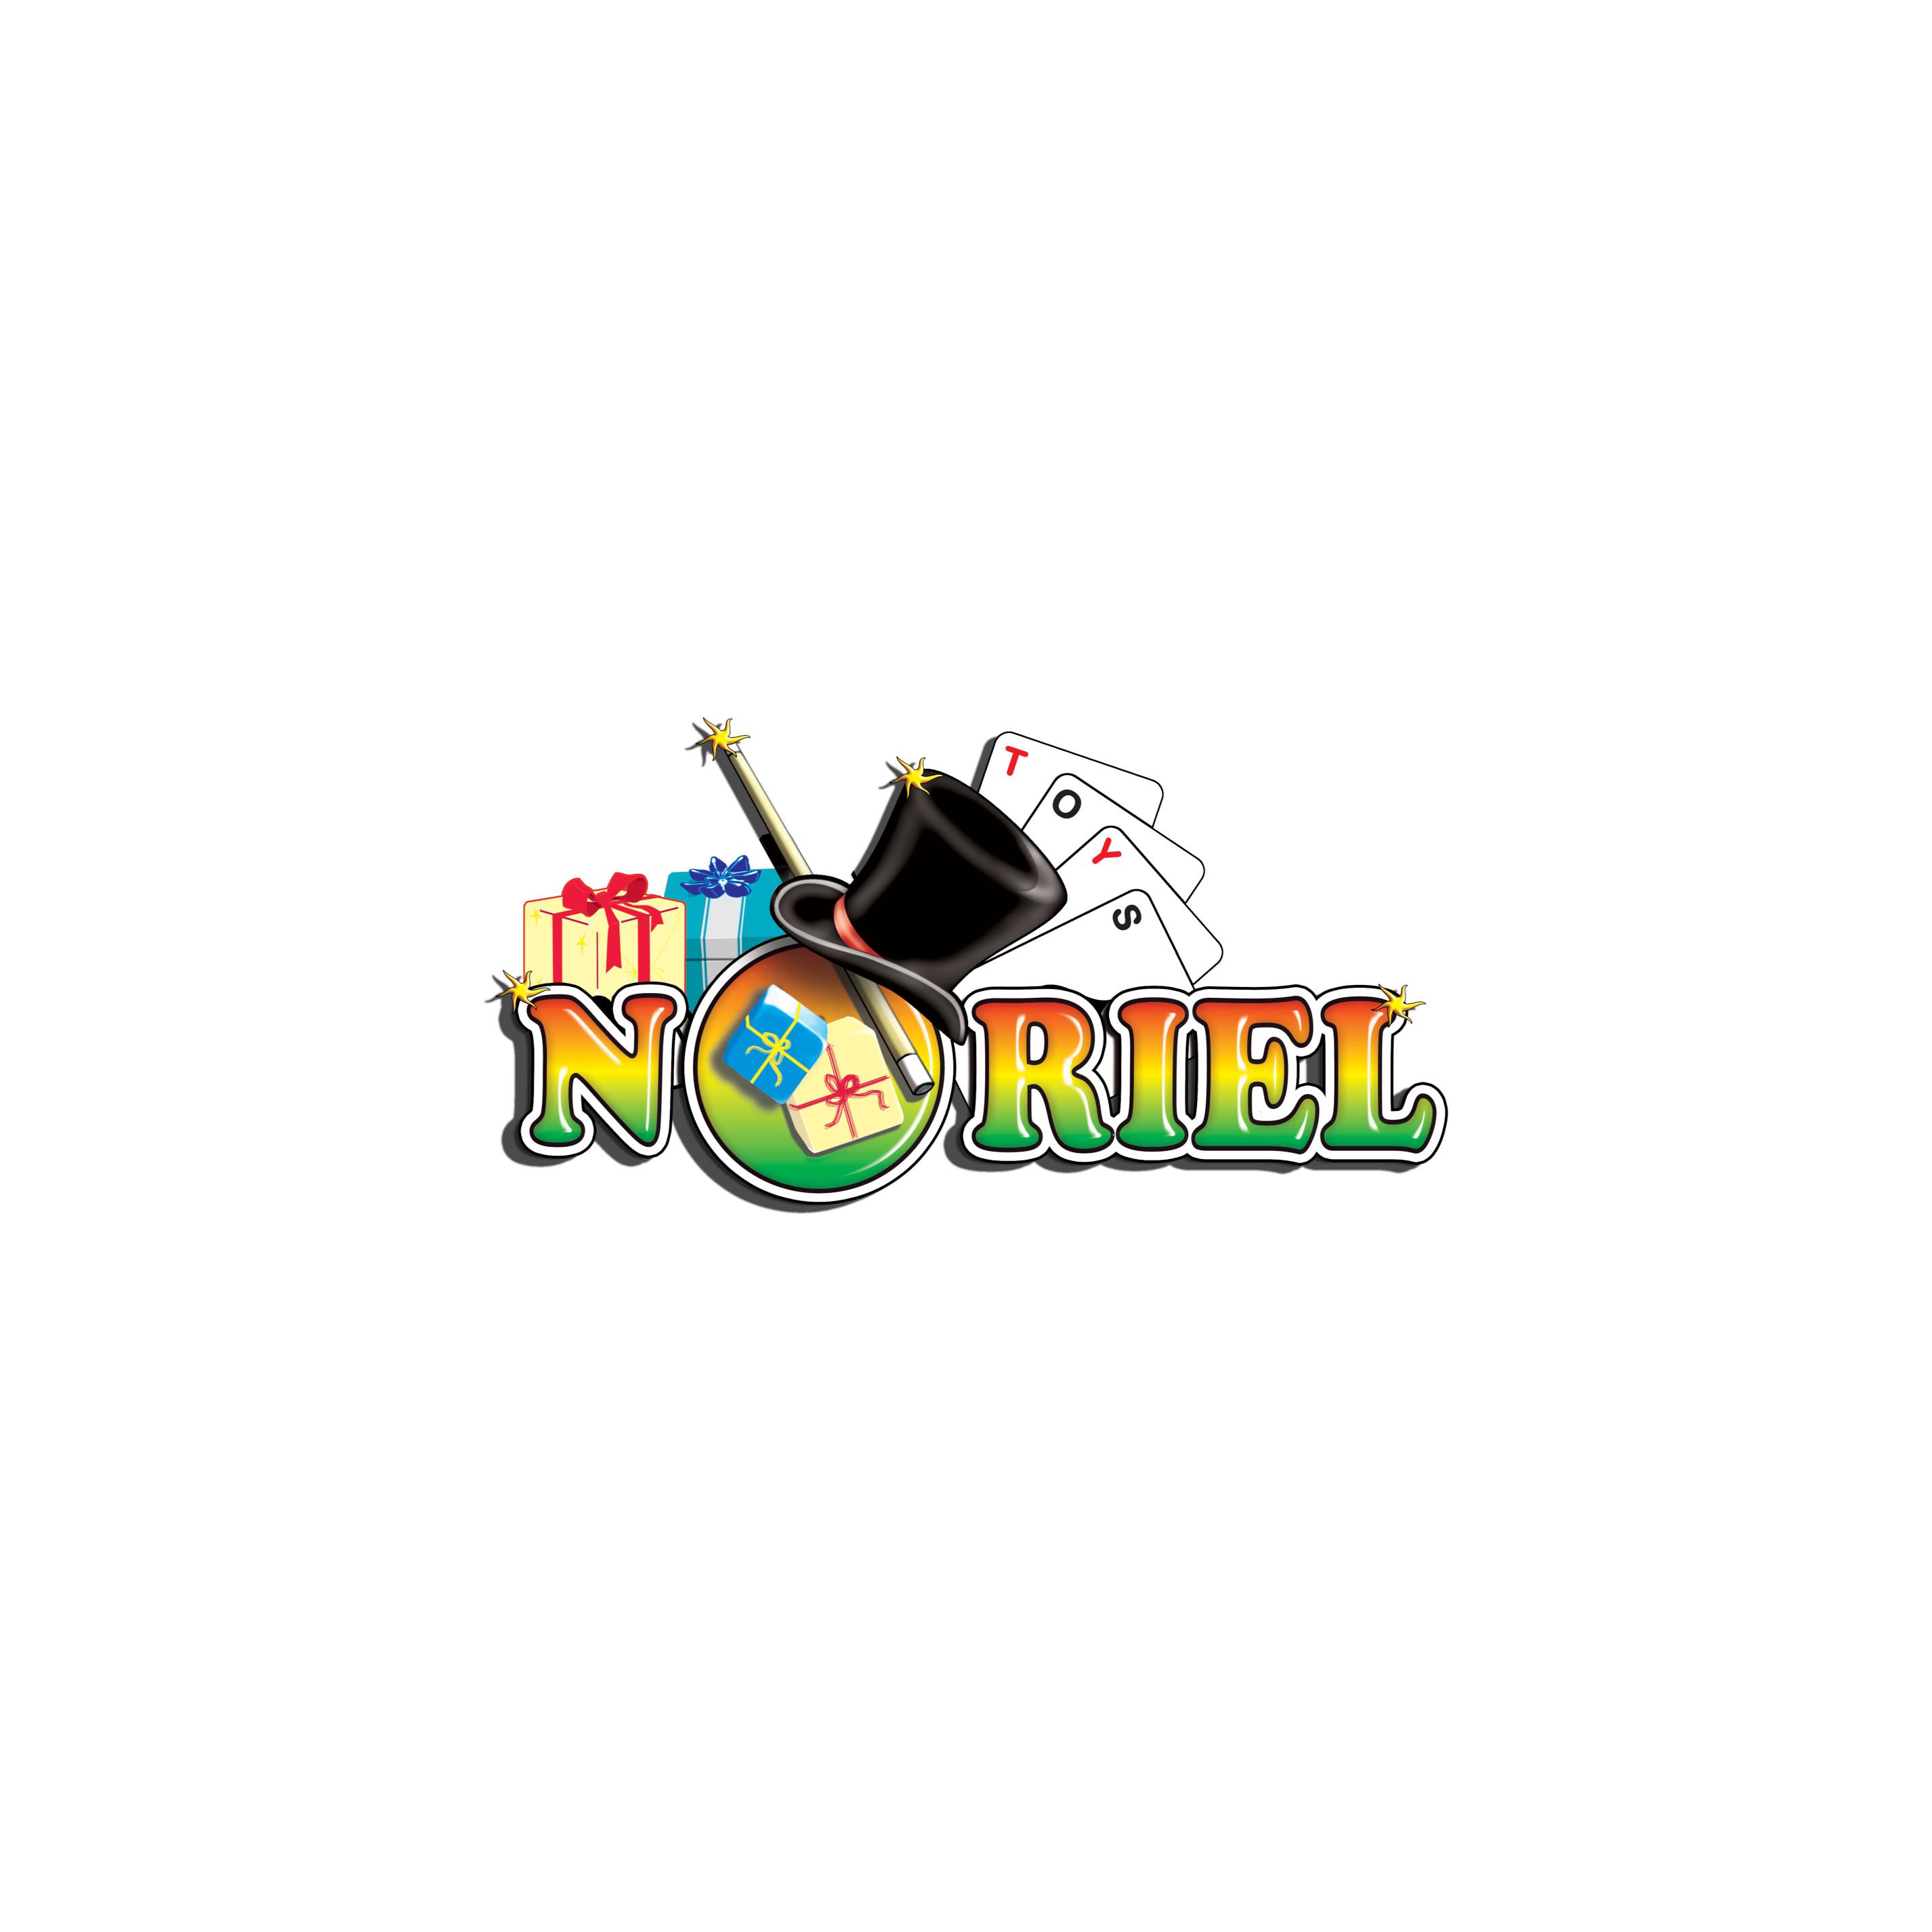 74933_001 - Set Incredibles 2 - Laboratorul si Fata Elastica